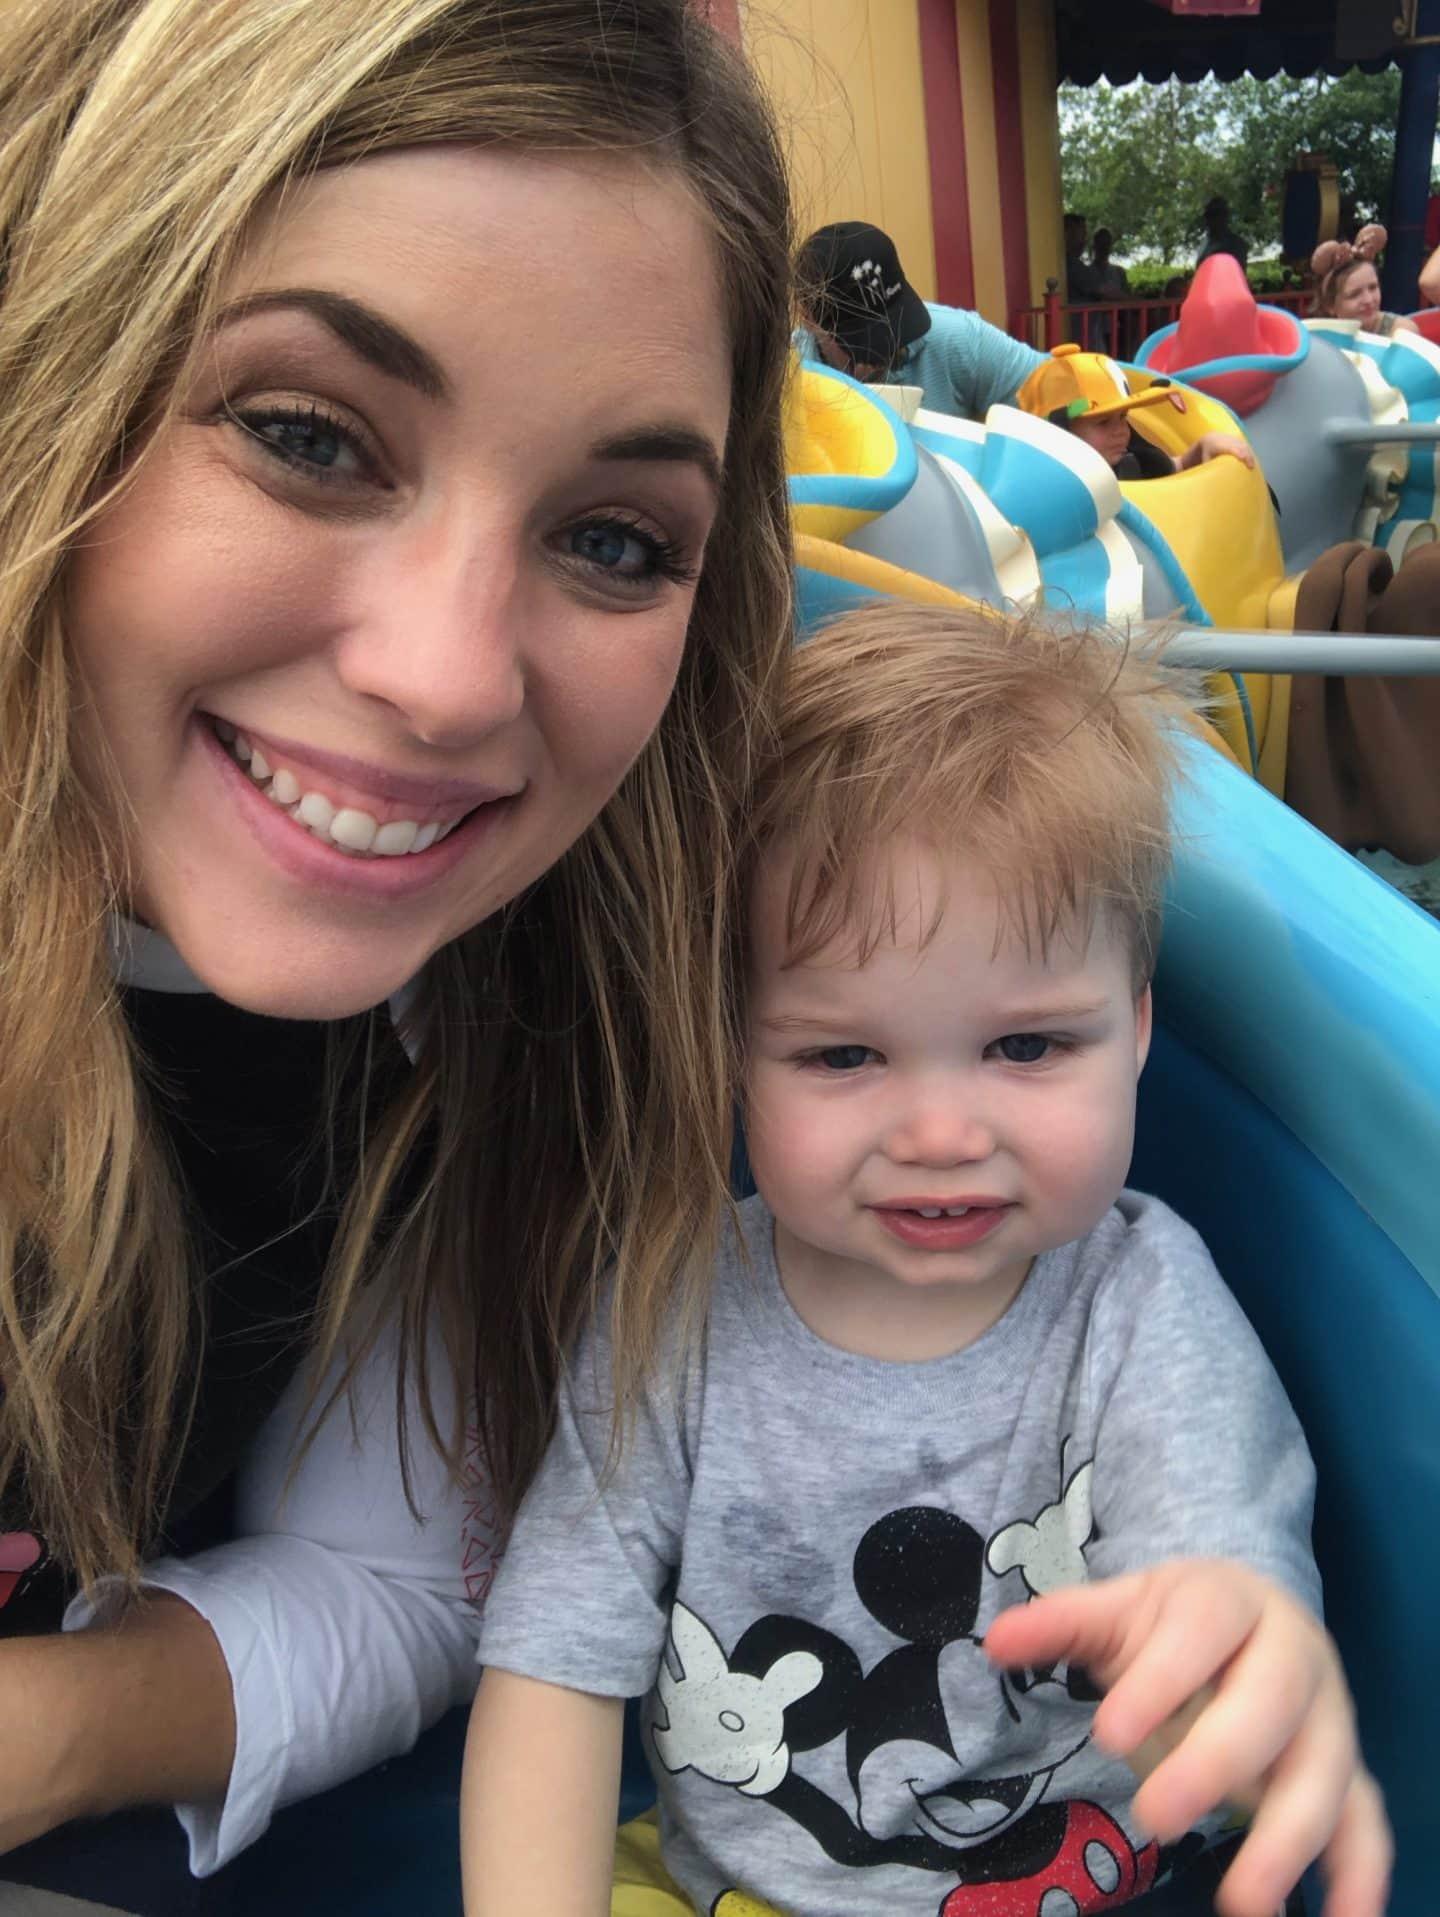 dumbo ride with toddler at magic kingdom Disney World